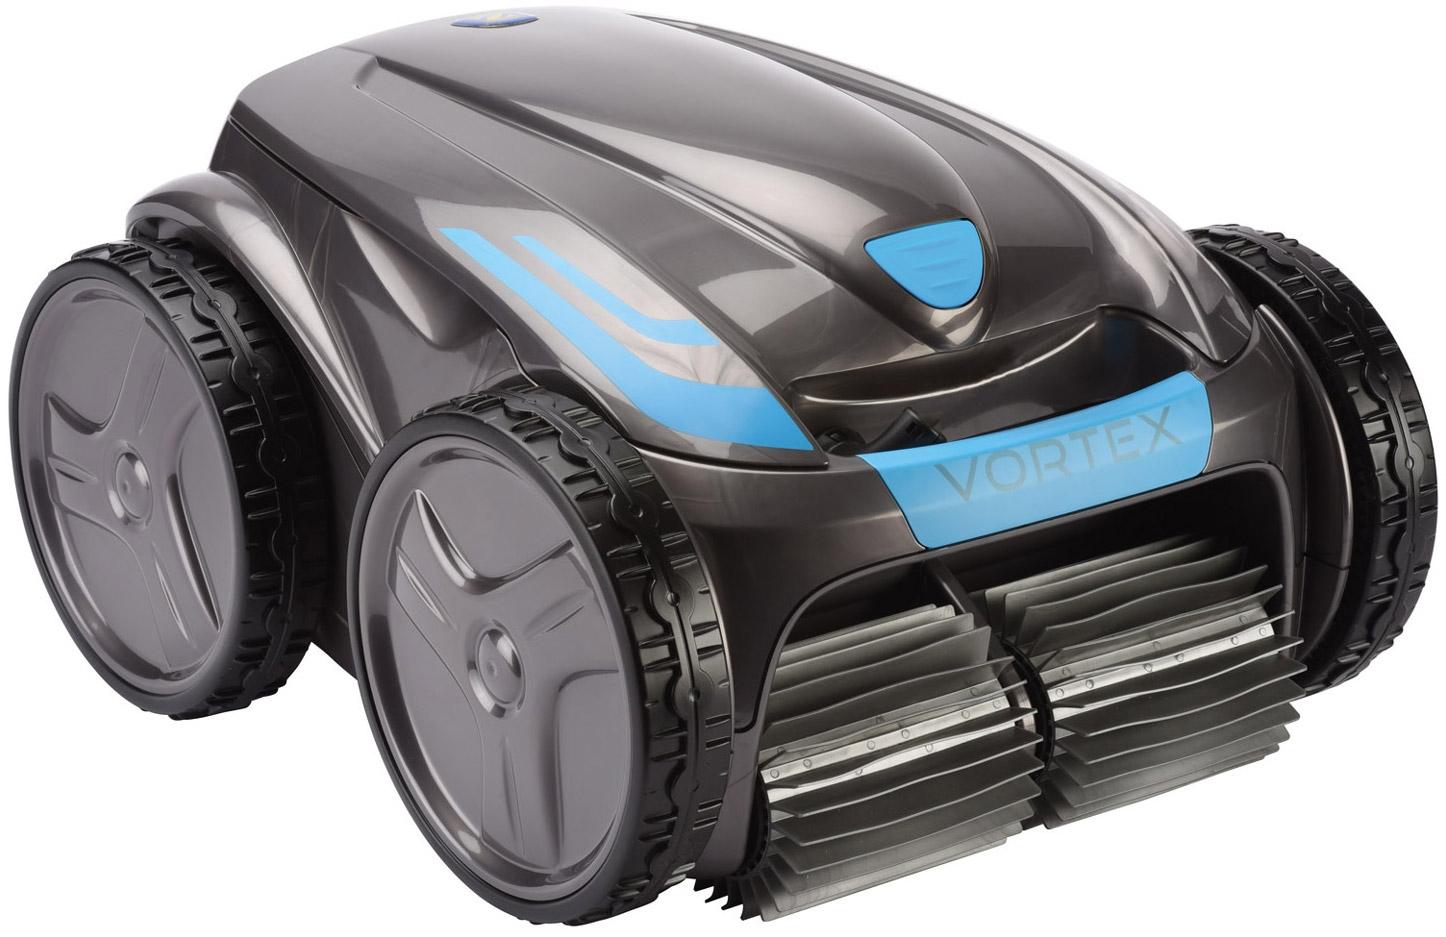 Zodiac Vortex OV 5300 SW Poolroboter Poolsauger Modell 2020 WR000162